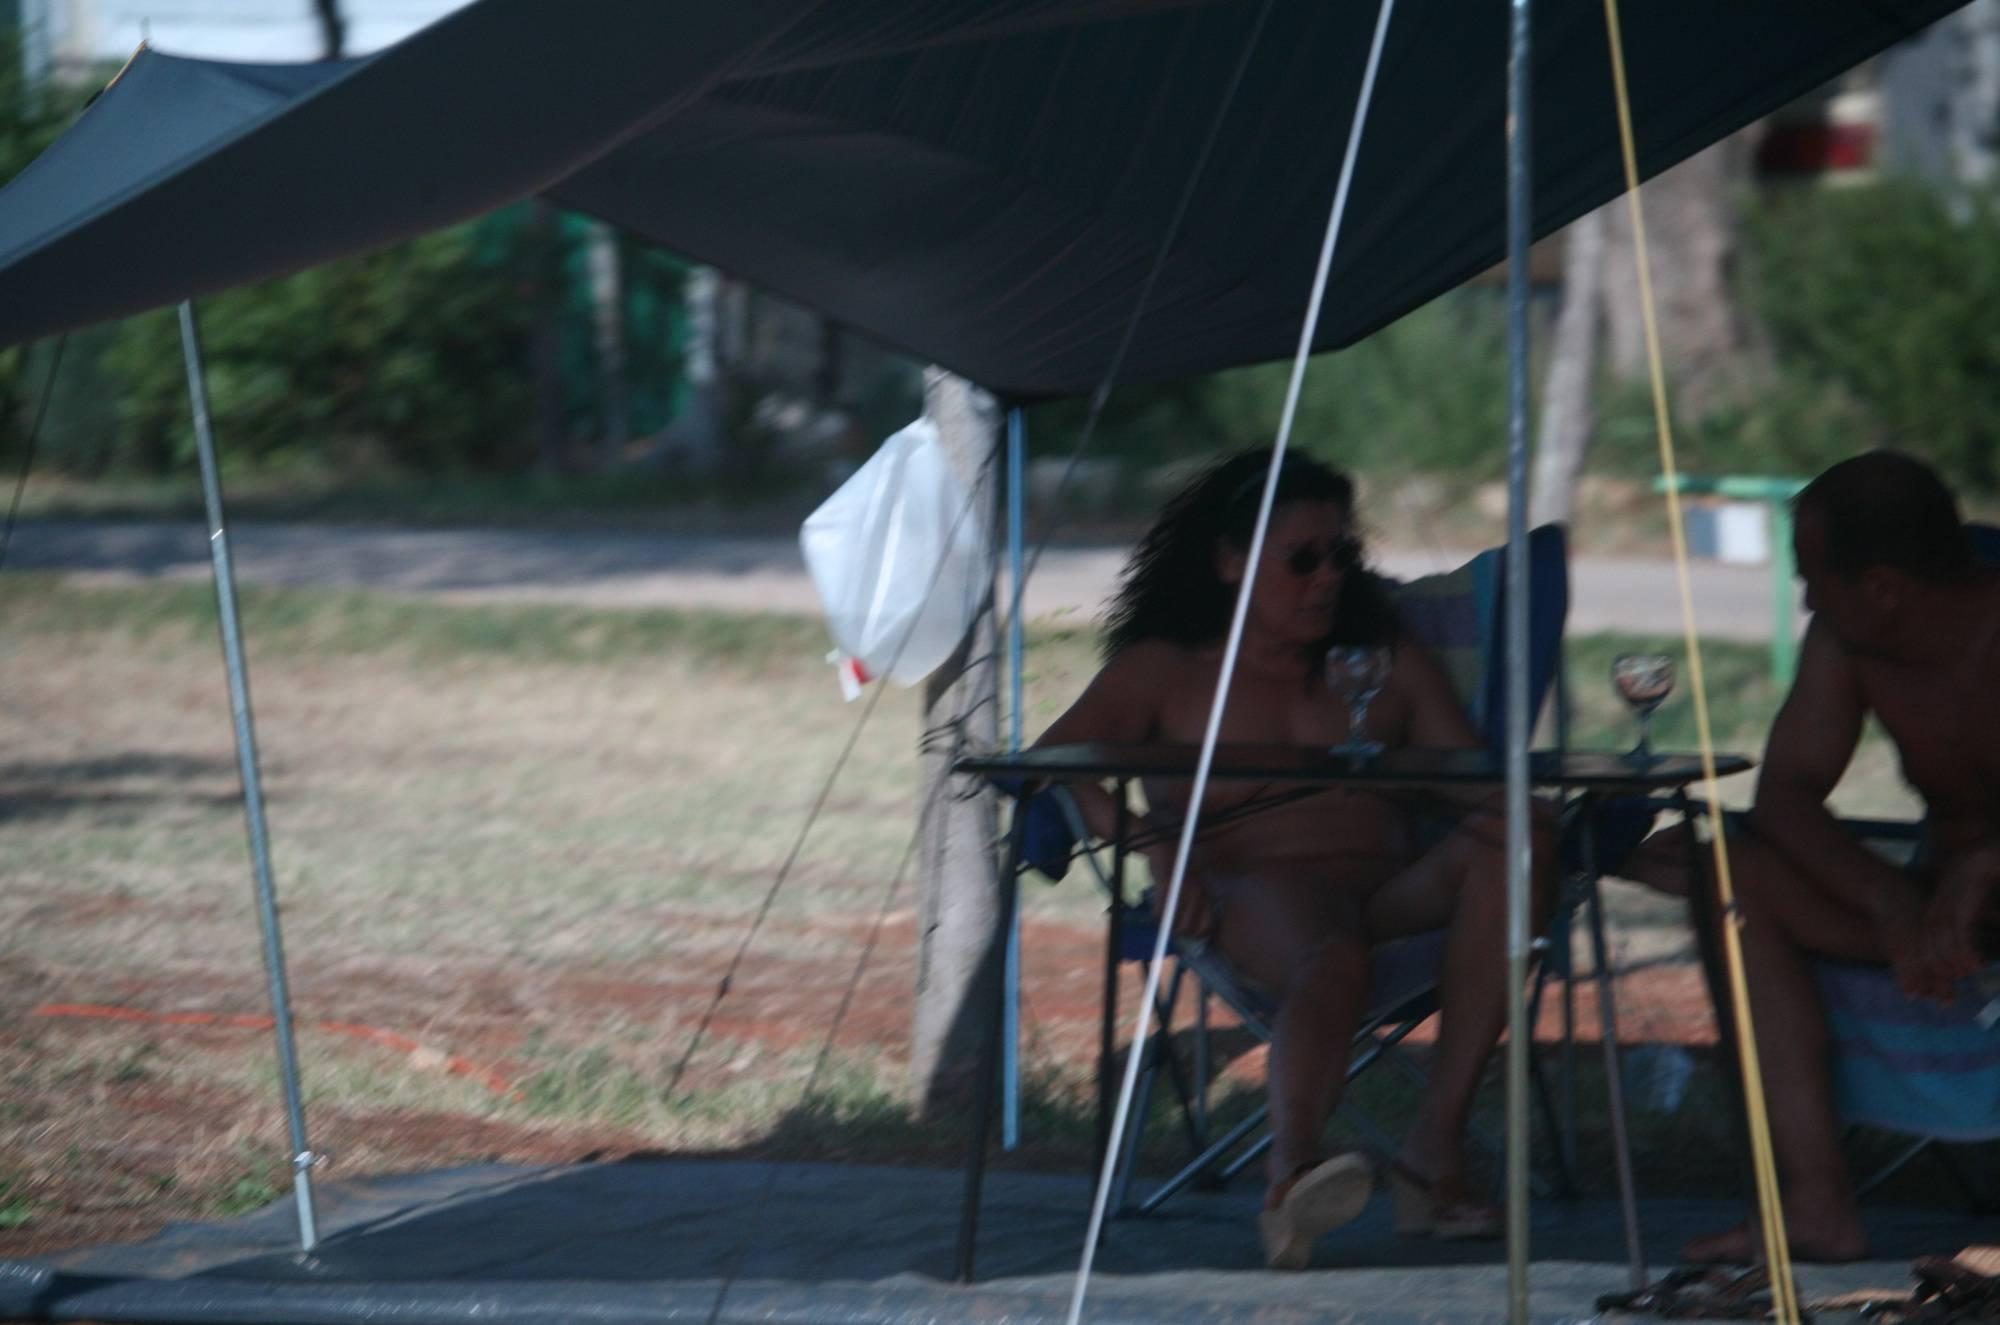 Nudist Pics Nora FKK Camping Sites - 1